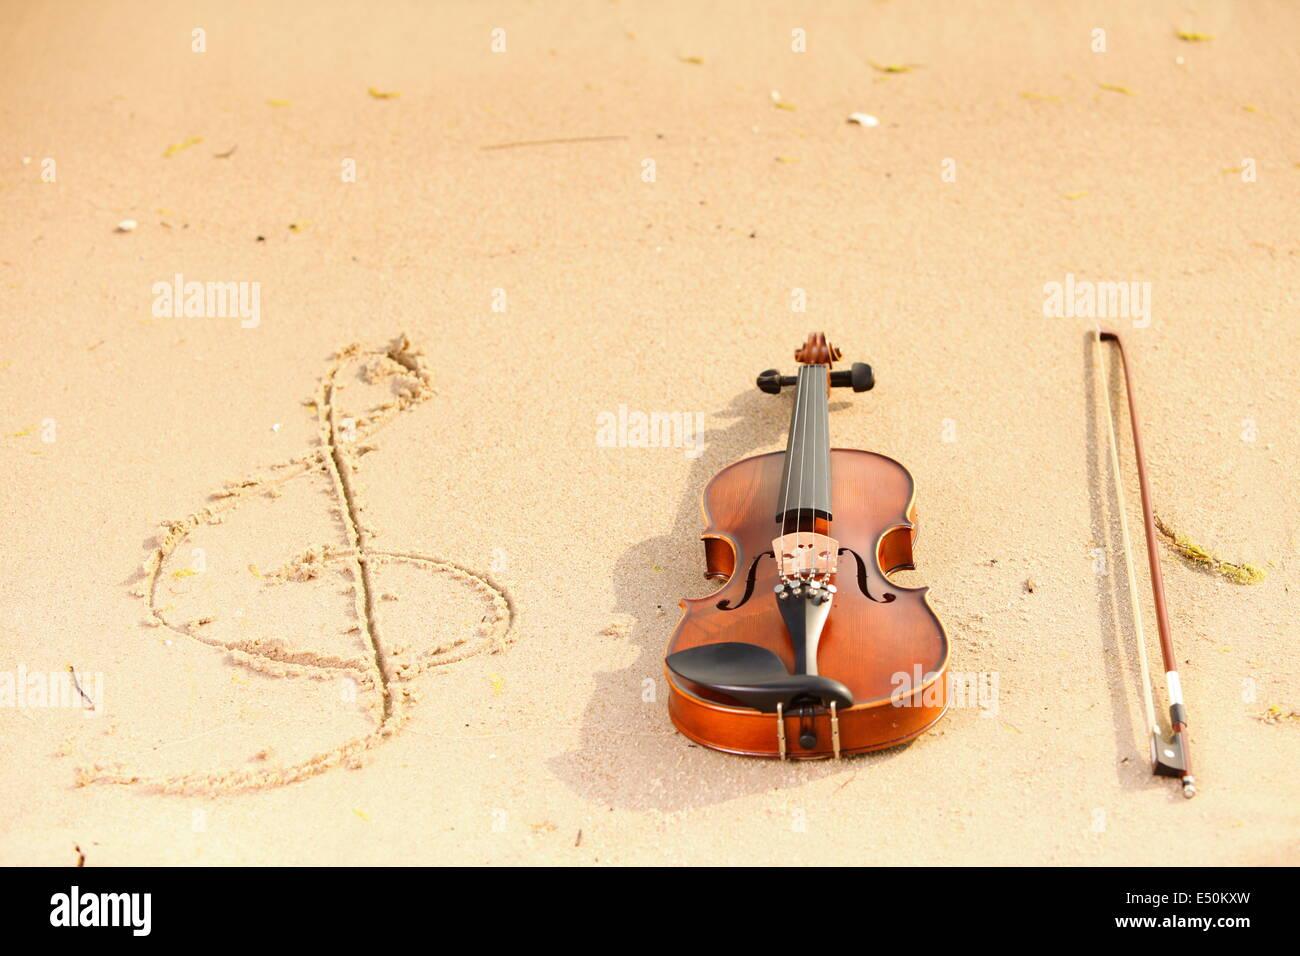 Violin Clef Stock Photos & Violin Clef Stock Images - Alamy